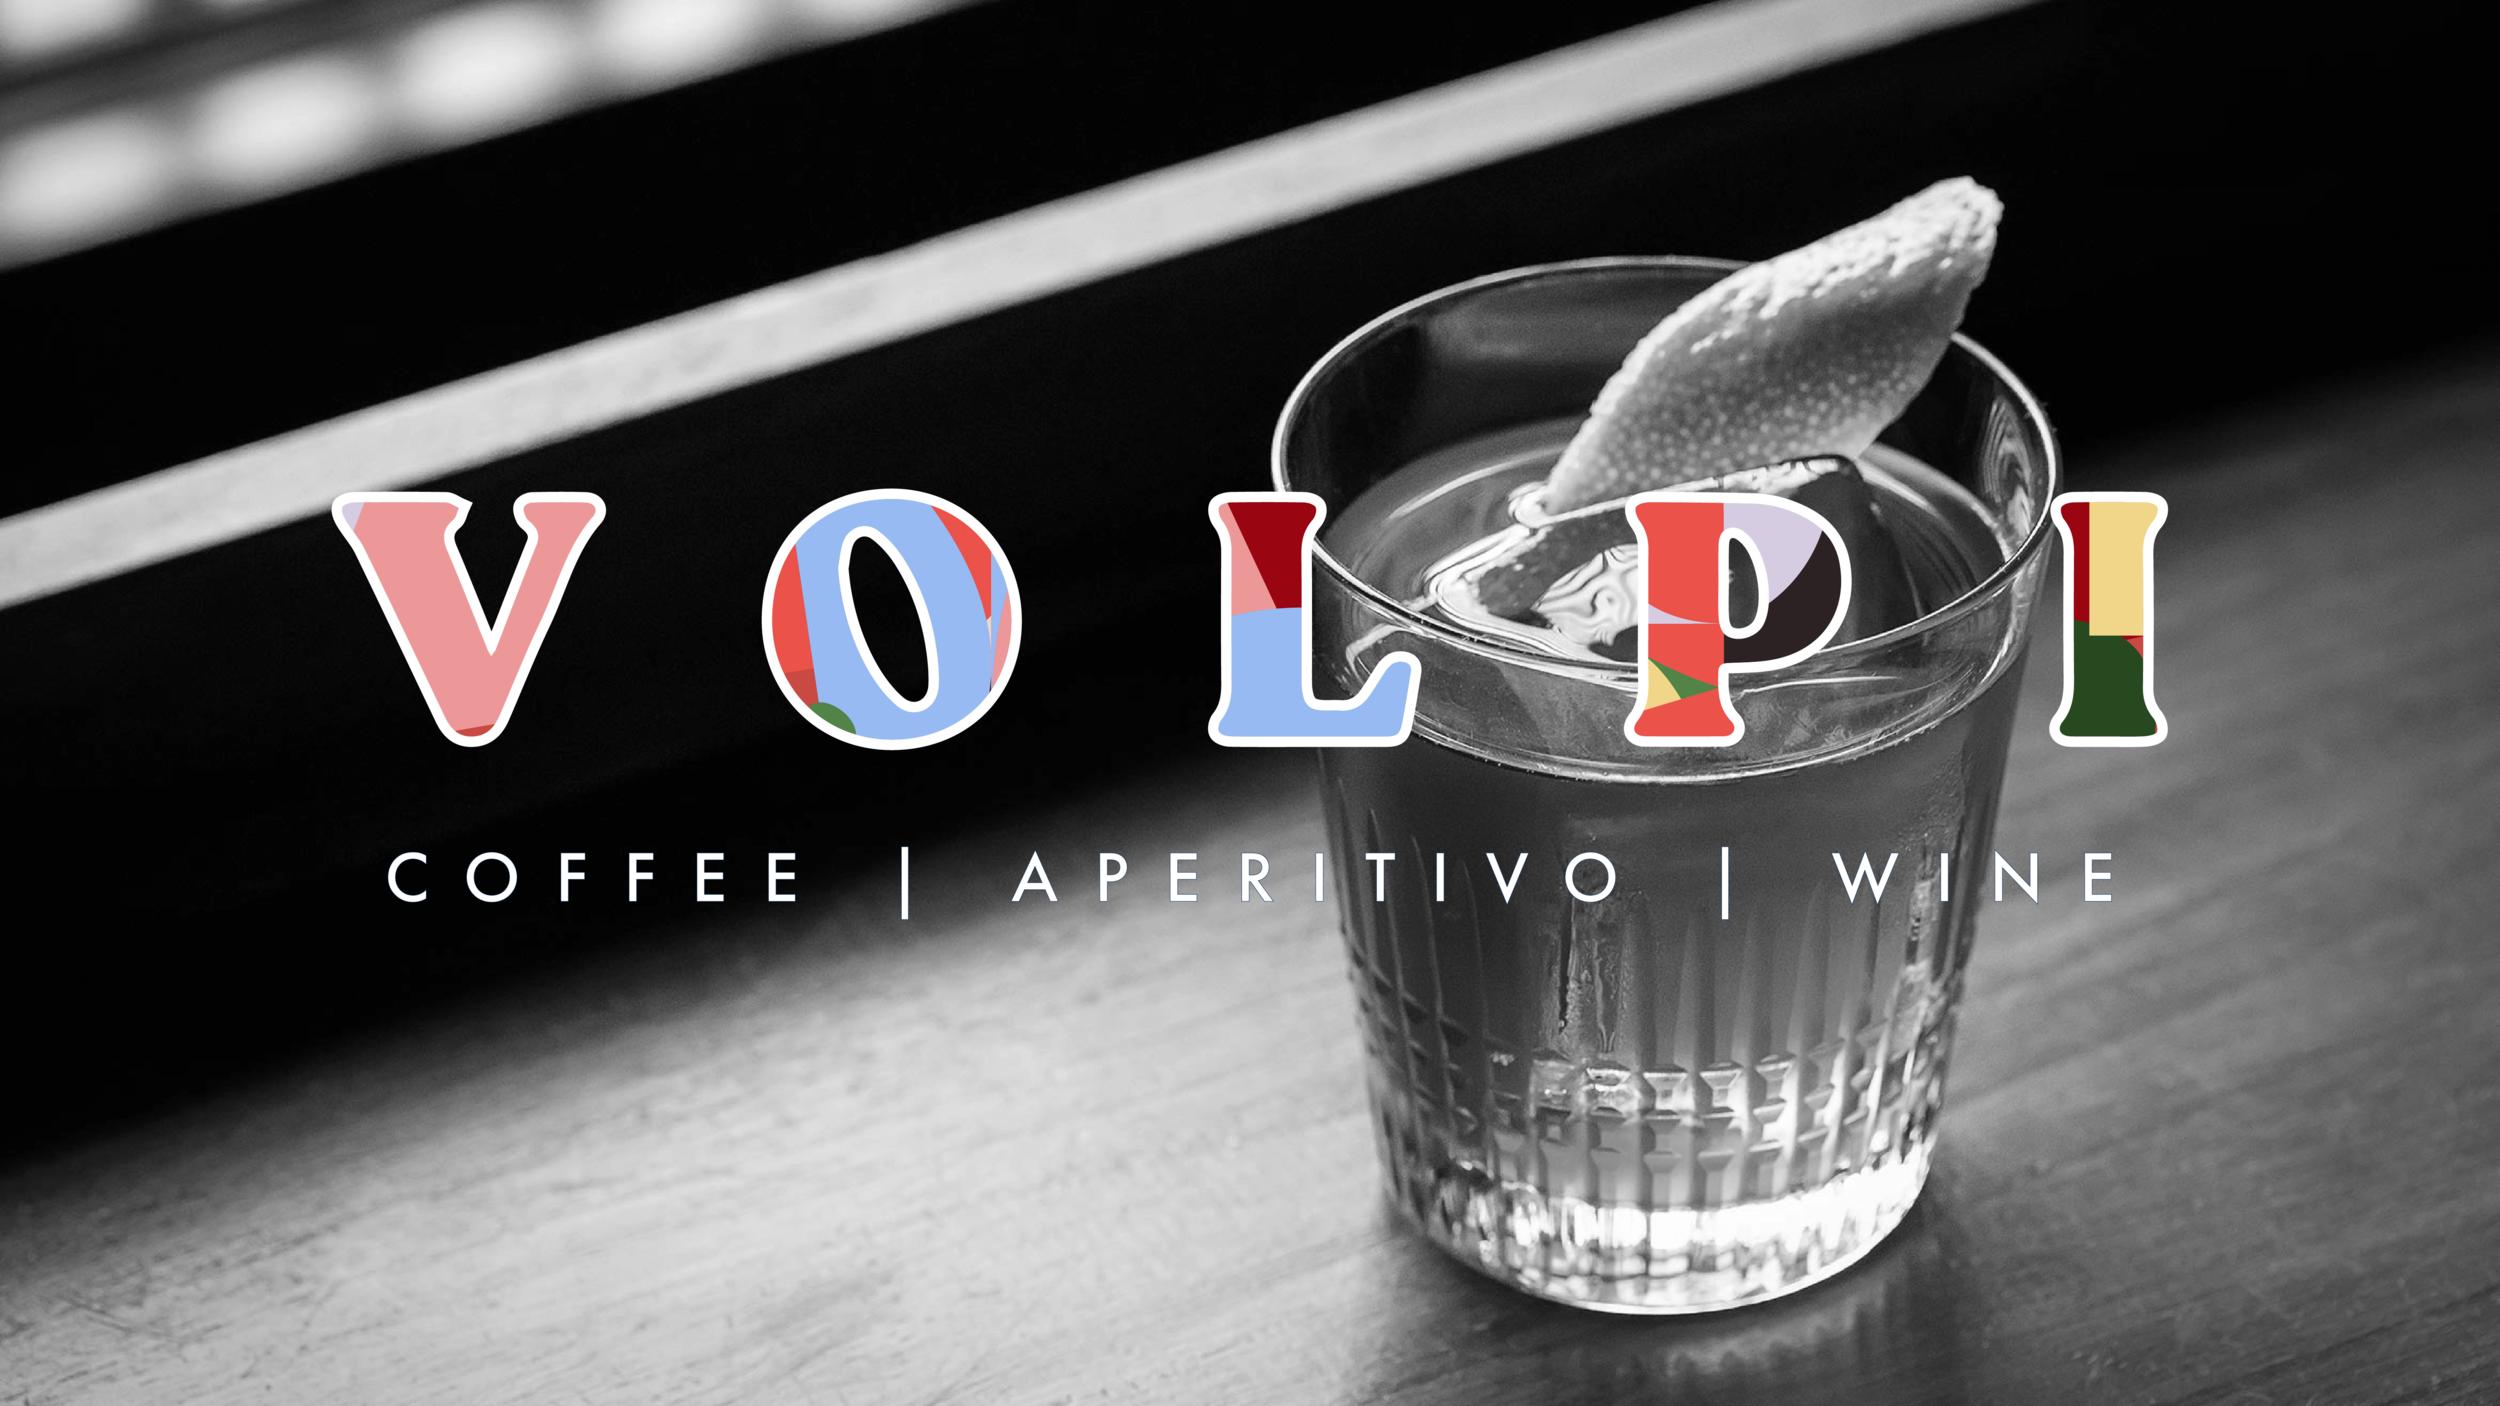 volpi website pic.png